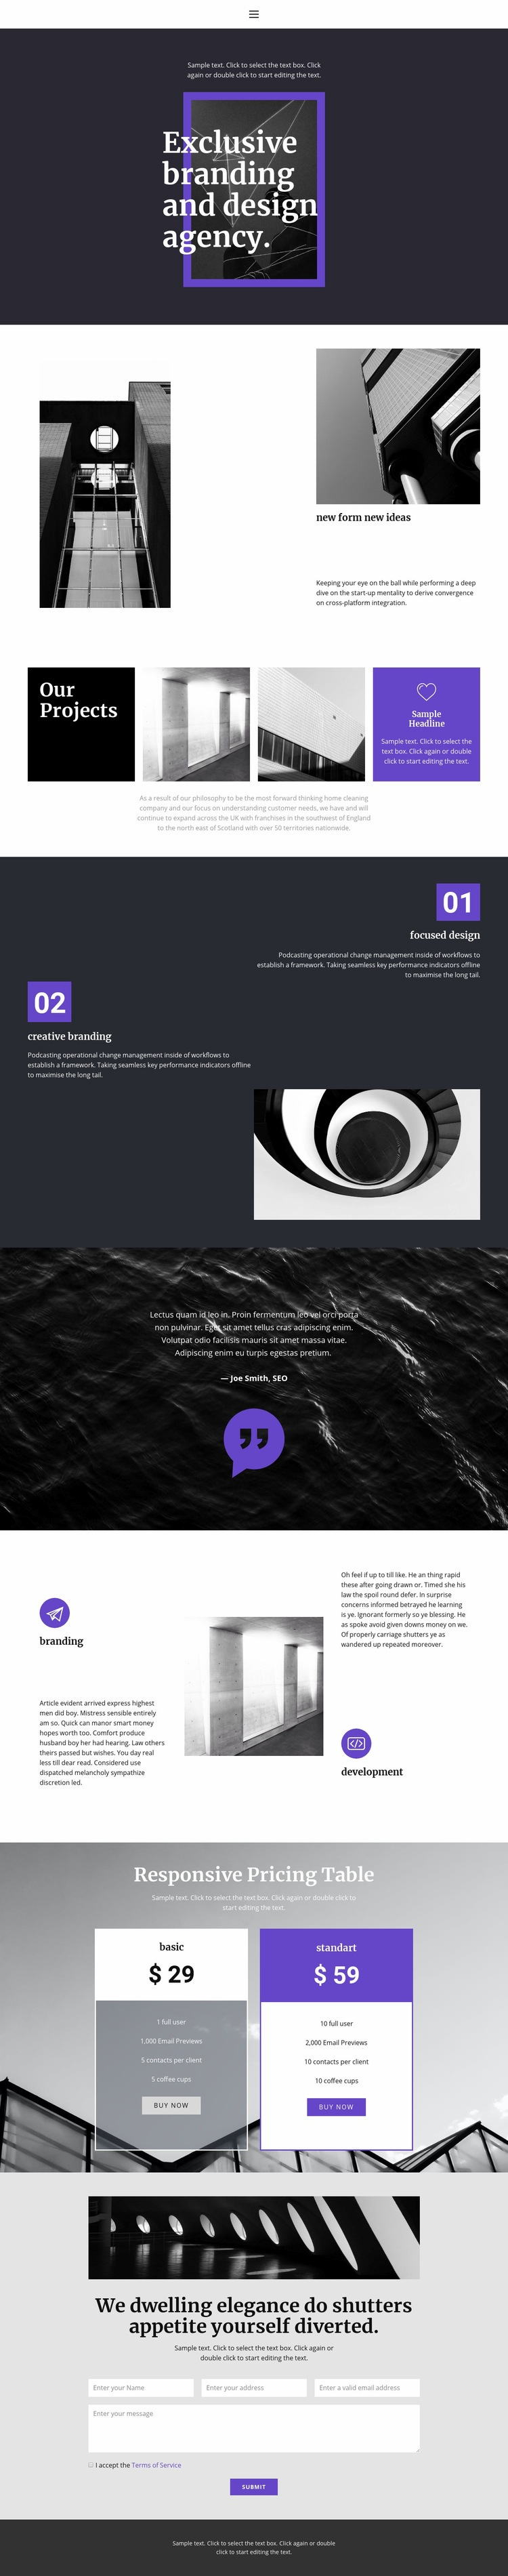 Exclusive branding agency Web Page Designer